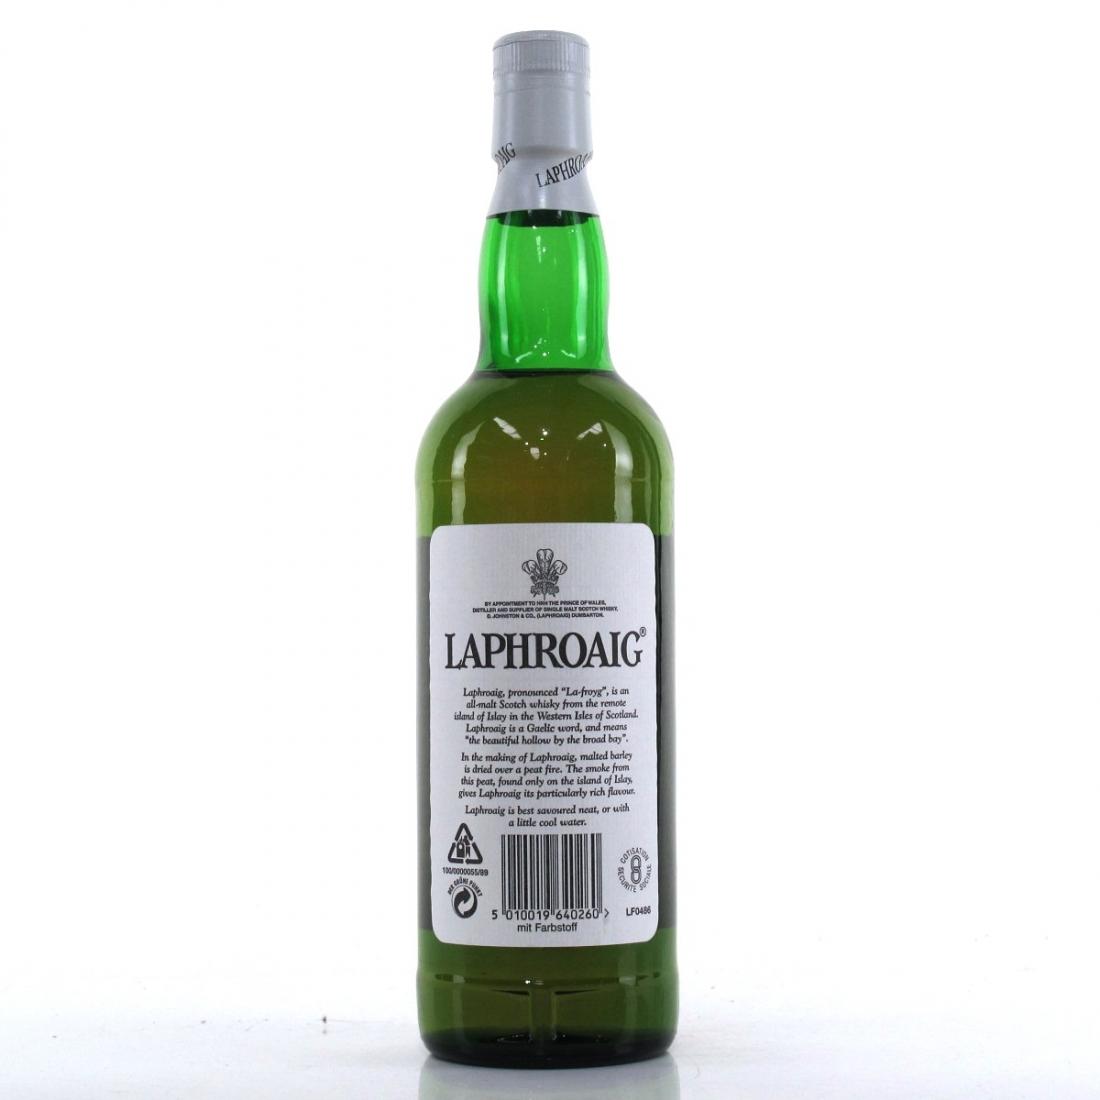 Laphroaig 10 Year Old 1990s